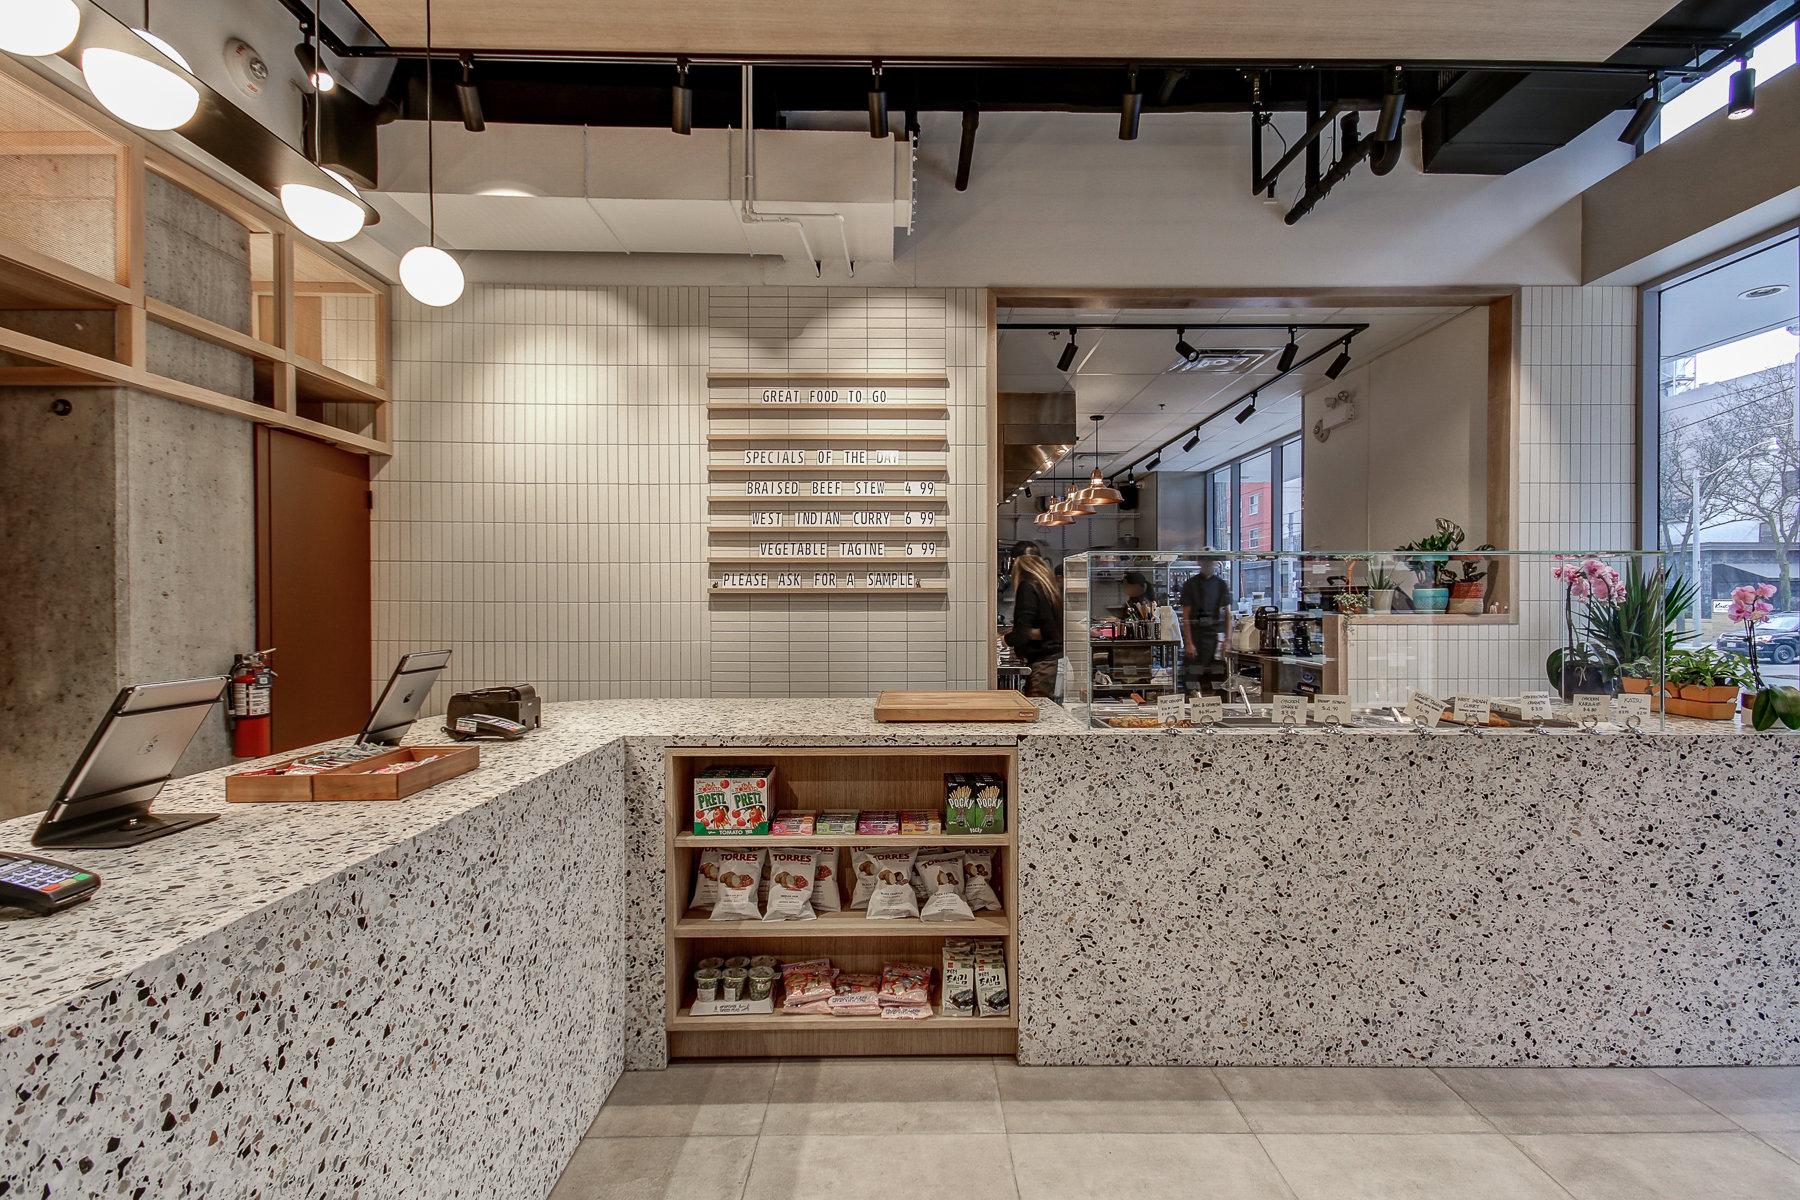 Fleets Food Restaurant - Toronto, ON